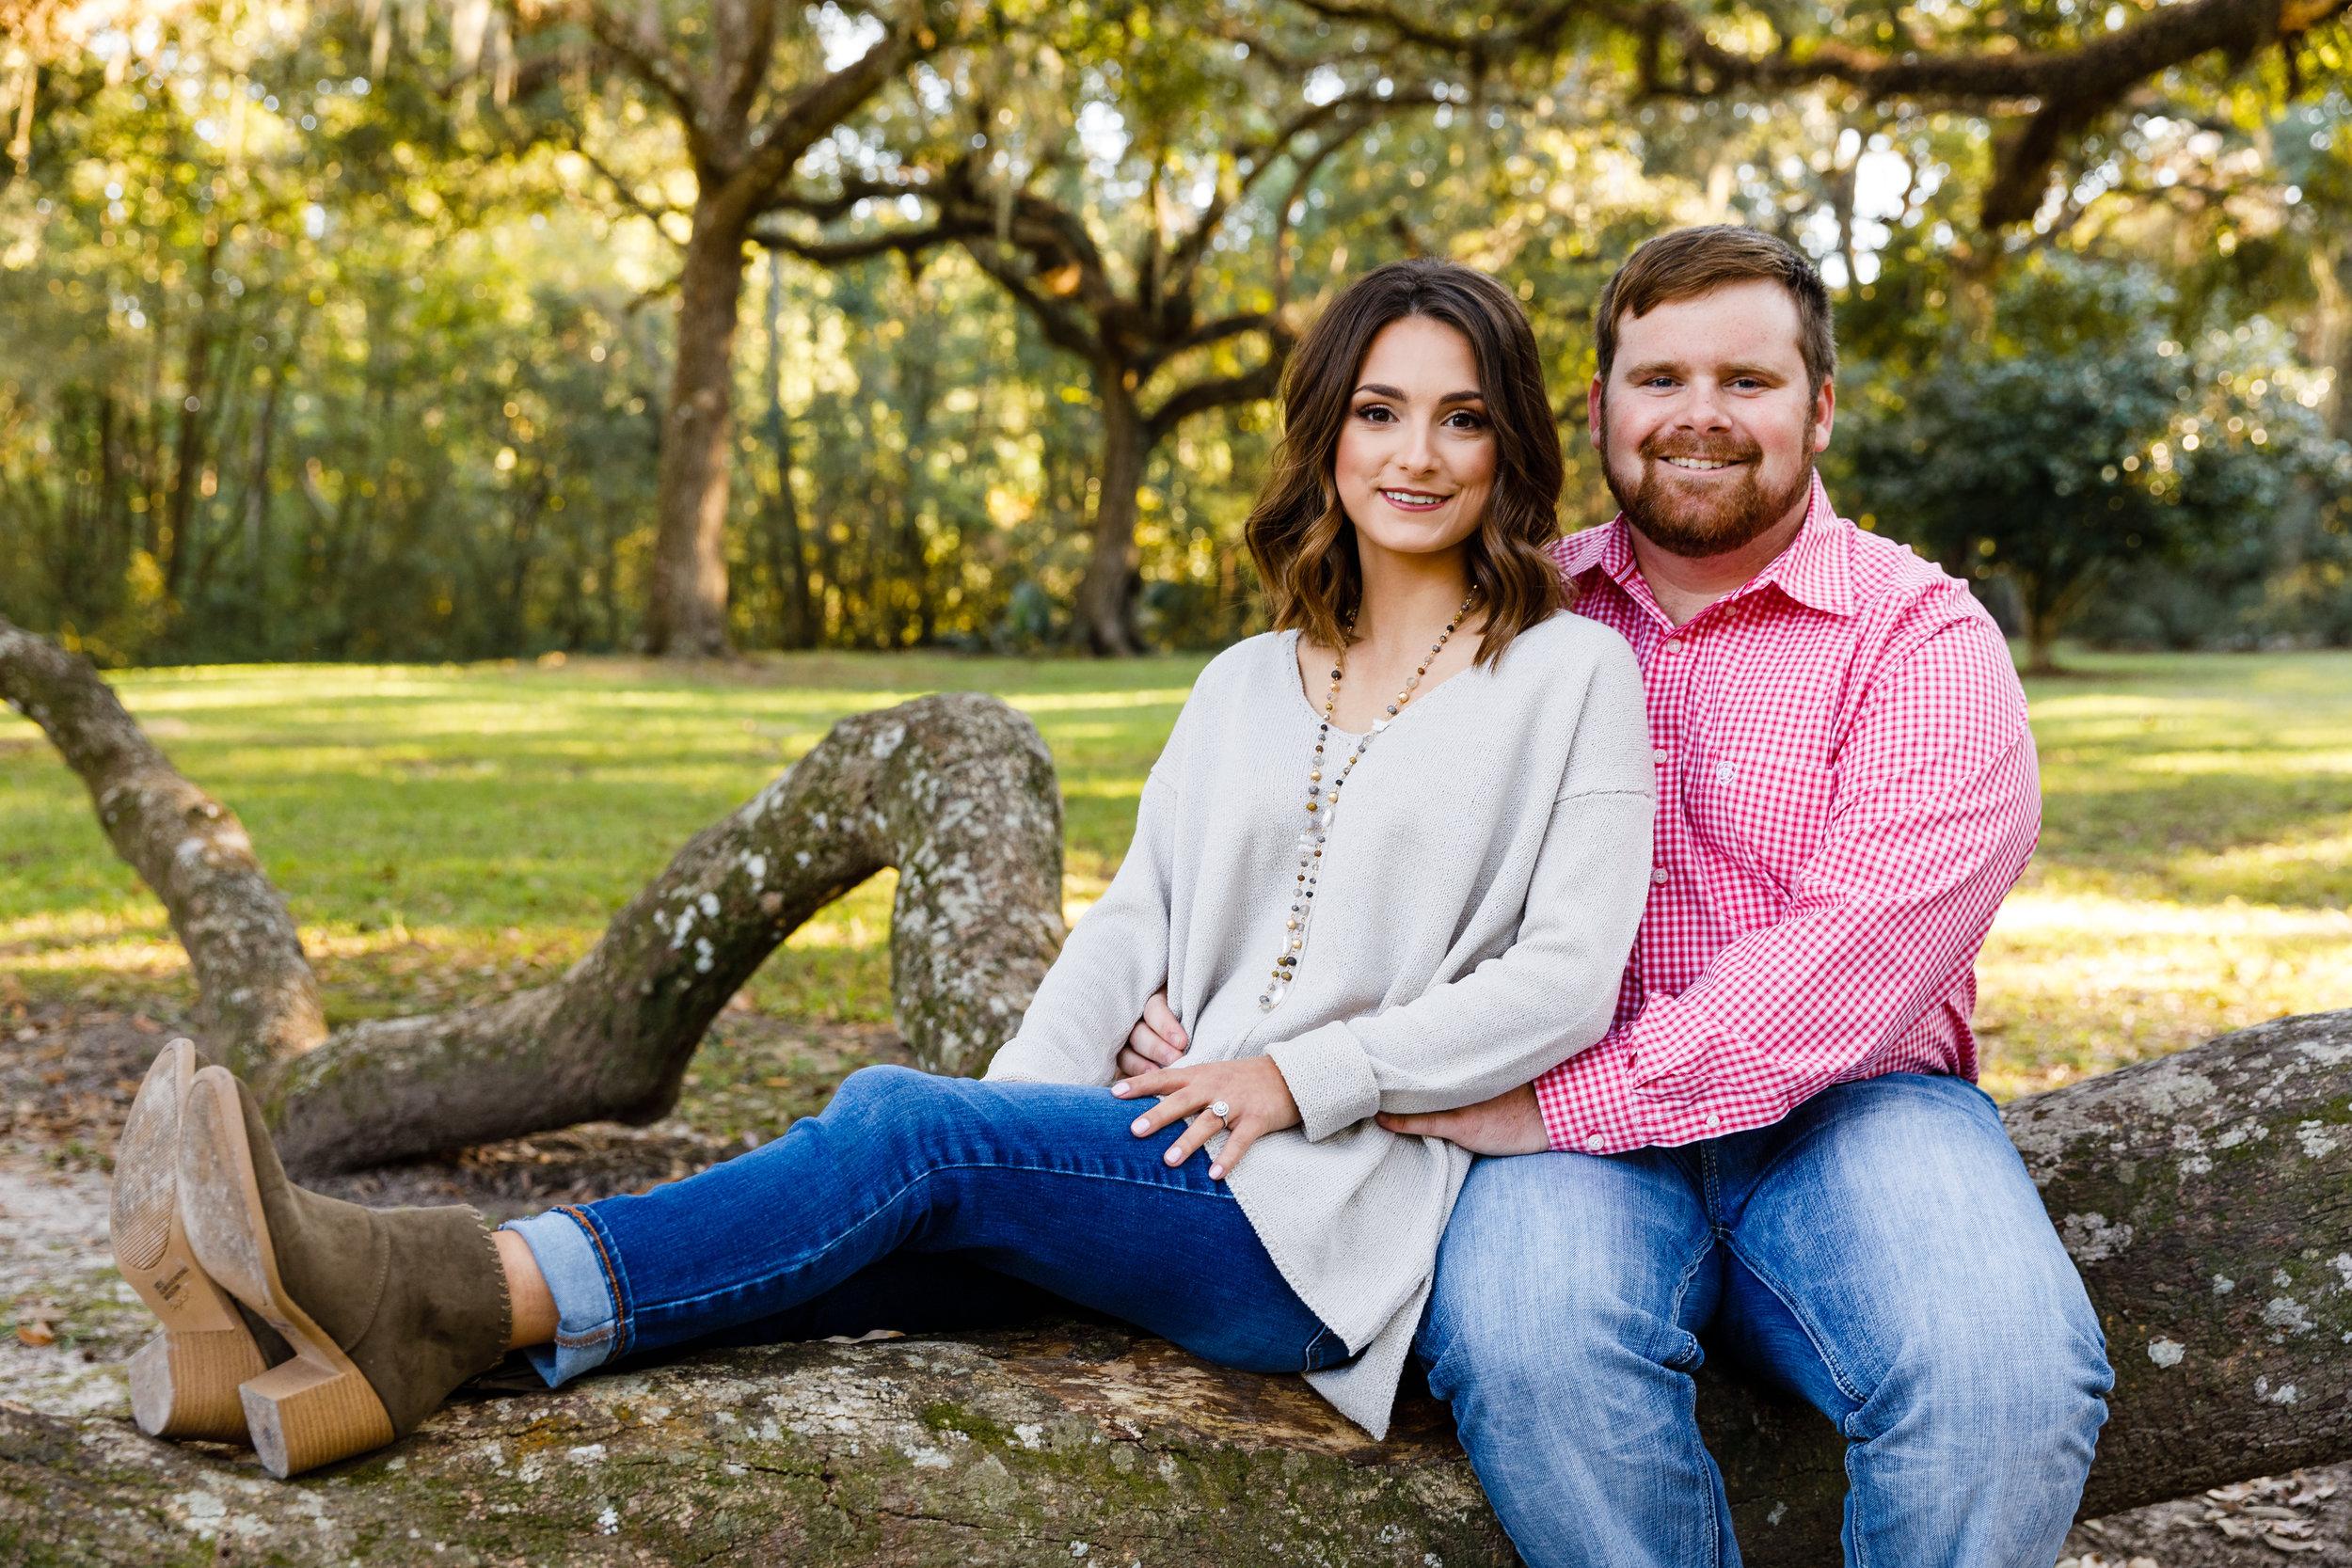 Youngsville-lafayette-portrait-family-wedding-photographer-0455.jpg